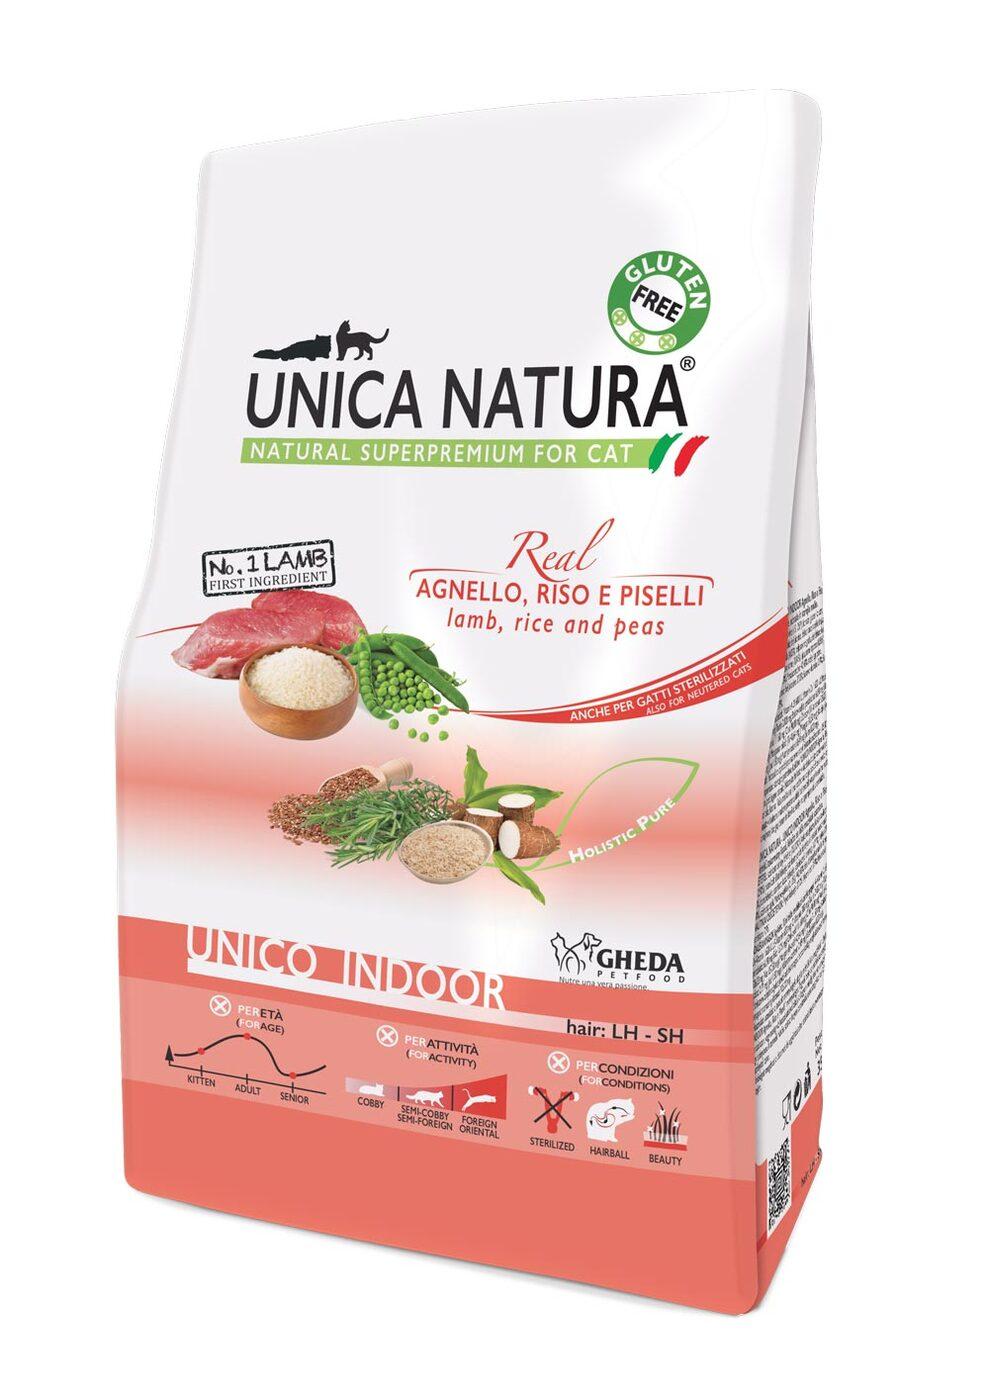 Сухой корм для кошек Unica Natura Unico Indoor - ягненок, рис, горох (1,5кг)